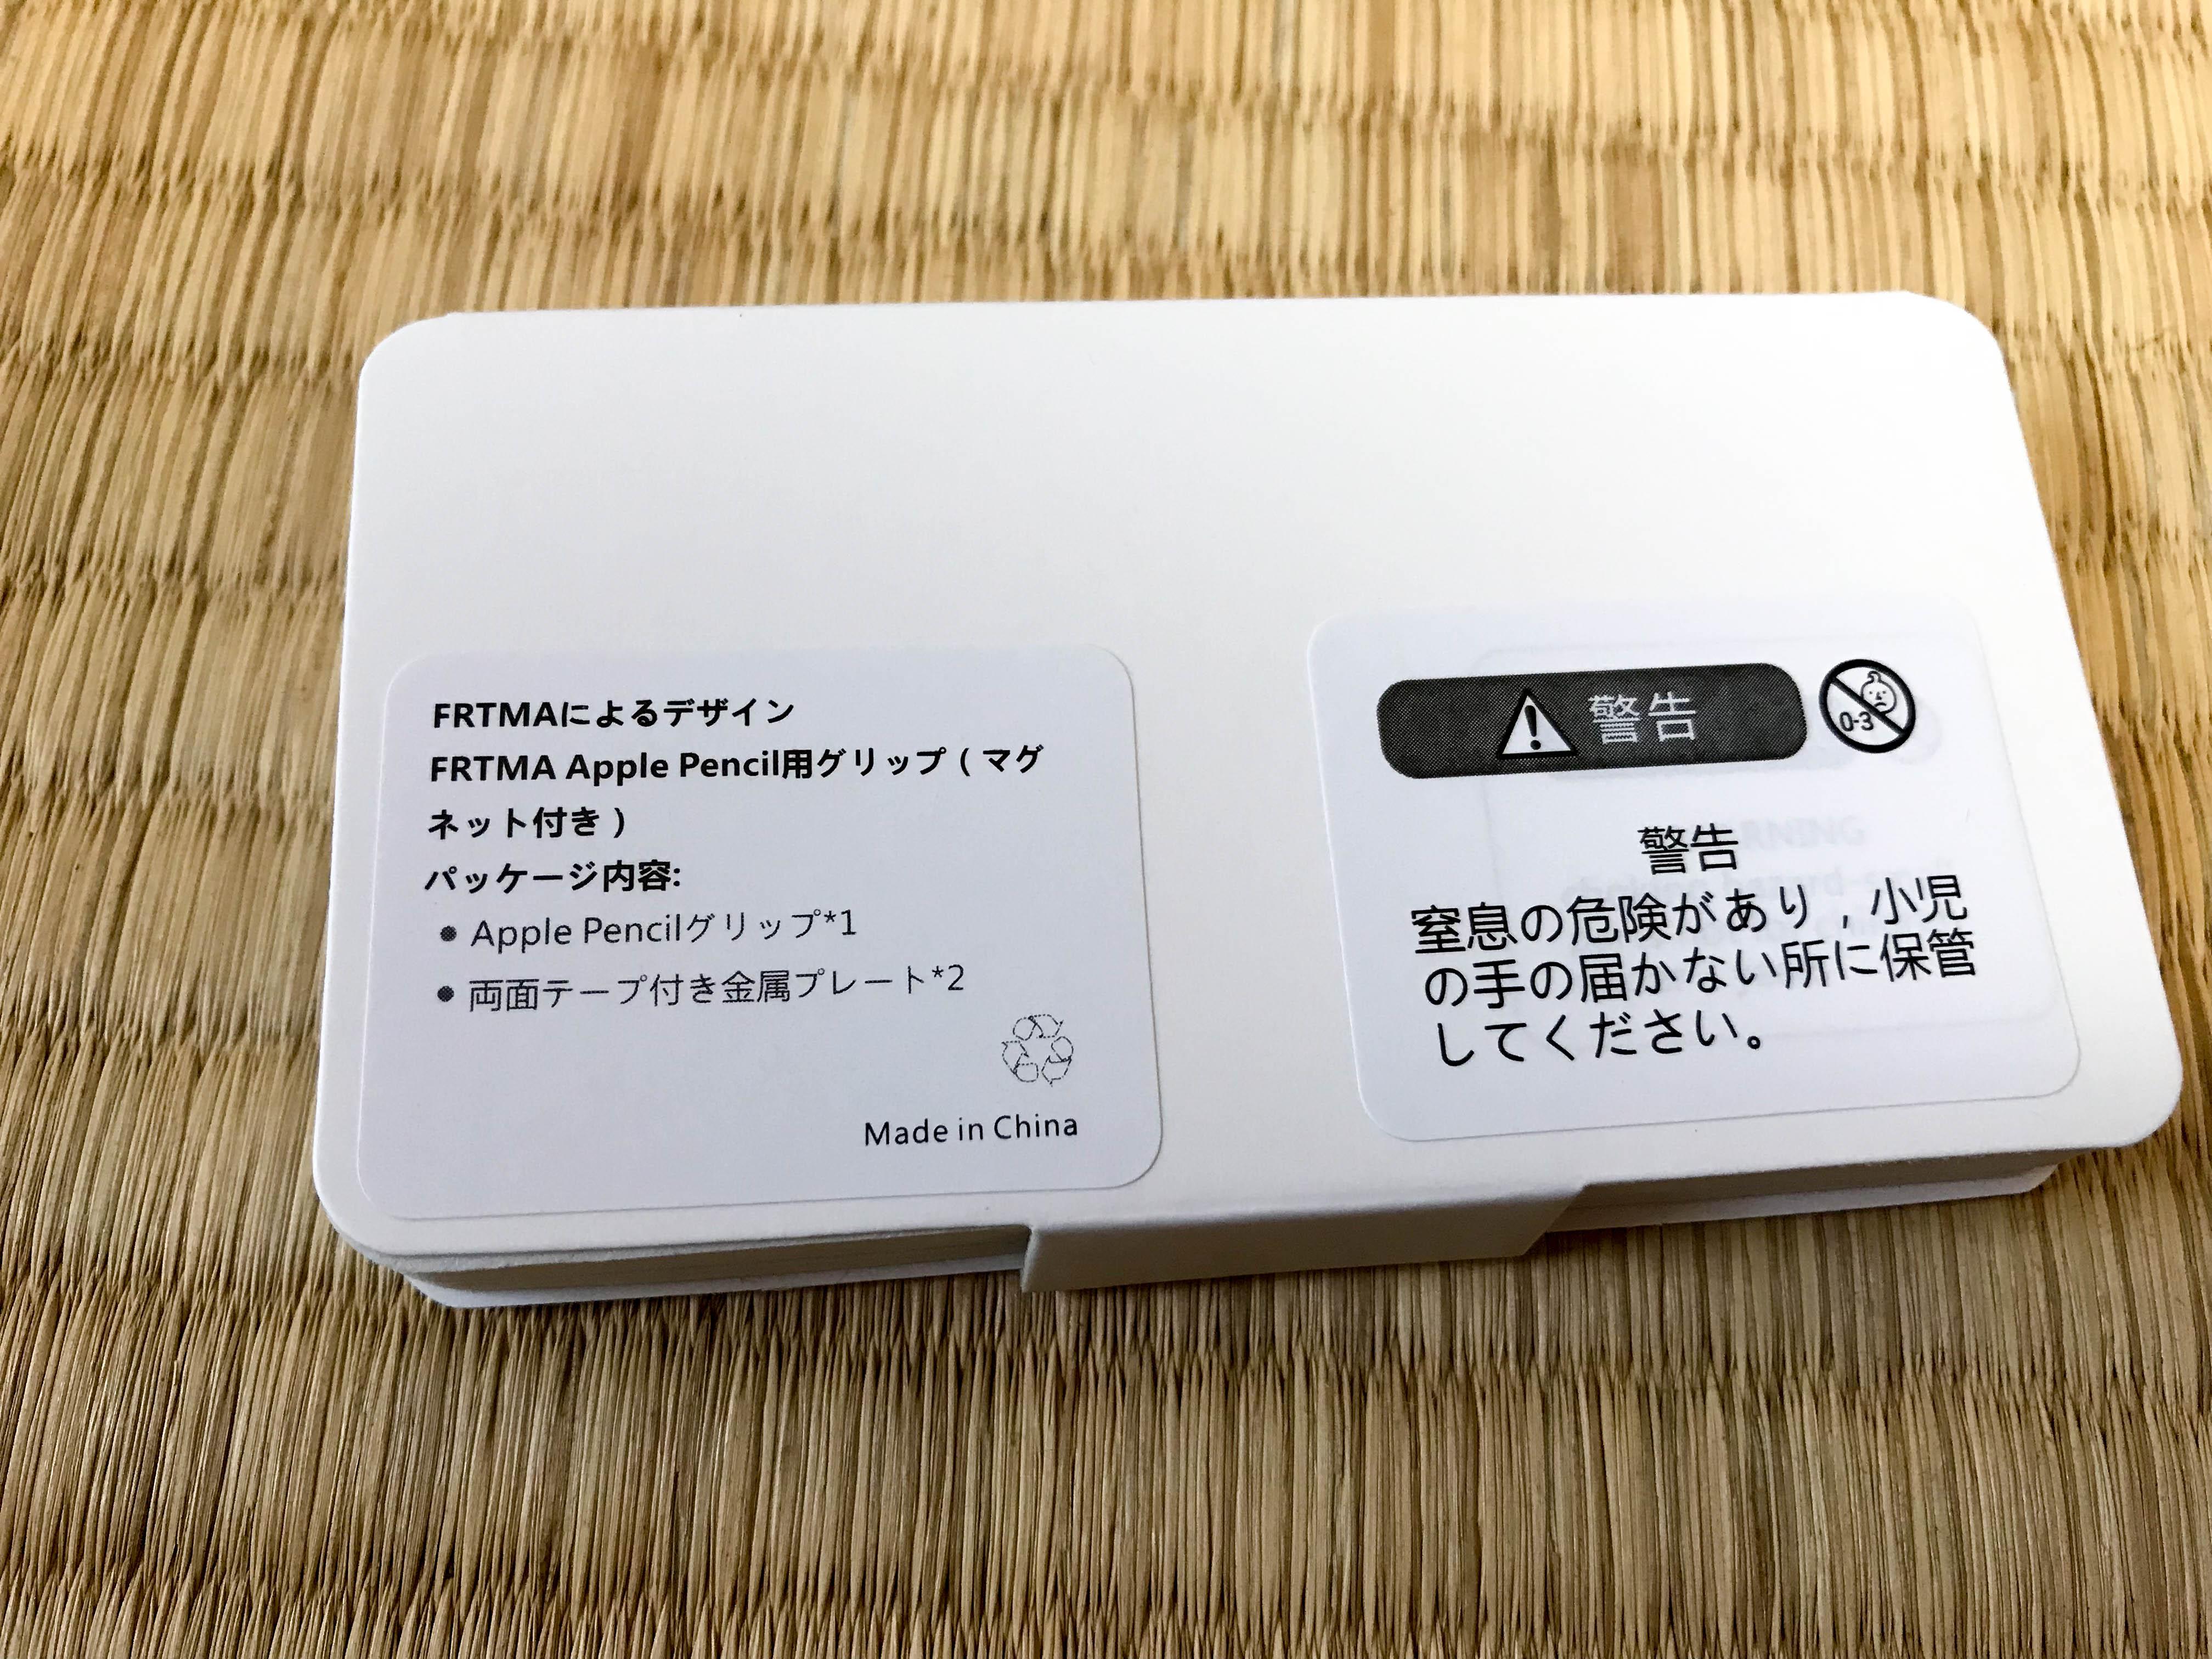 IMG 0761